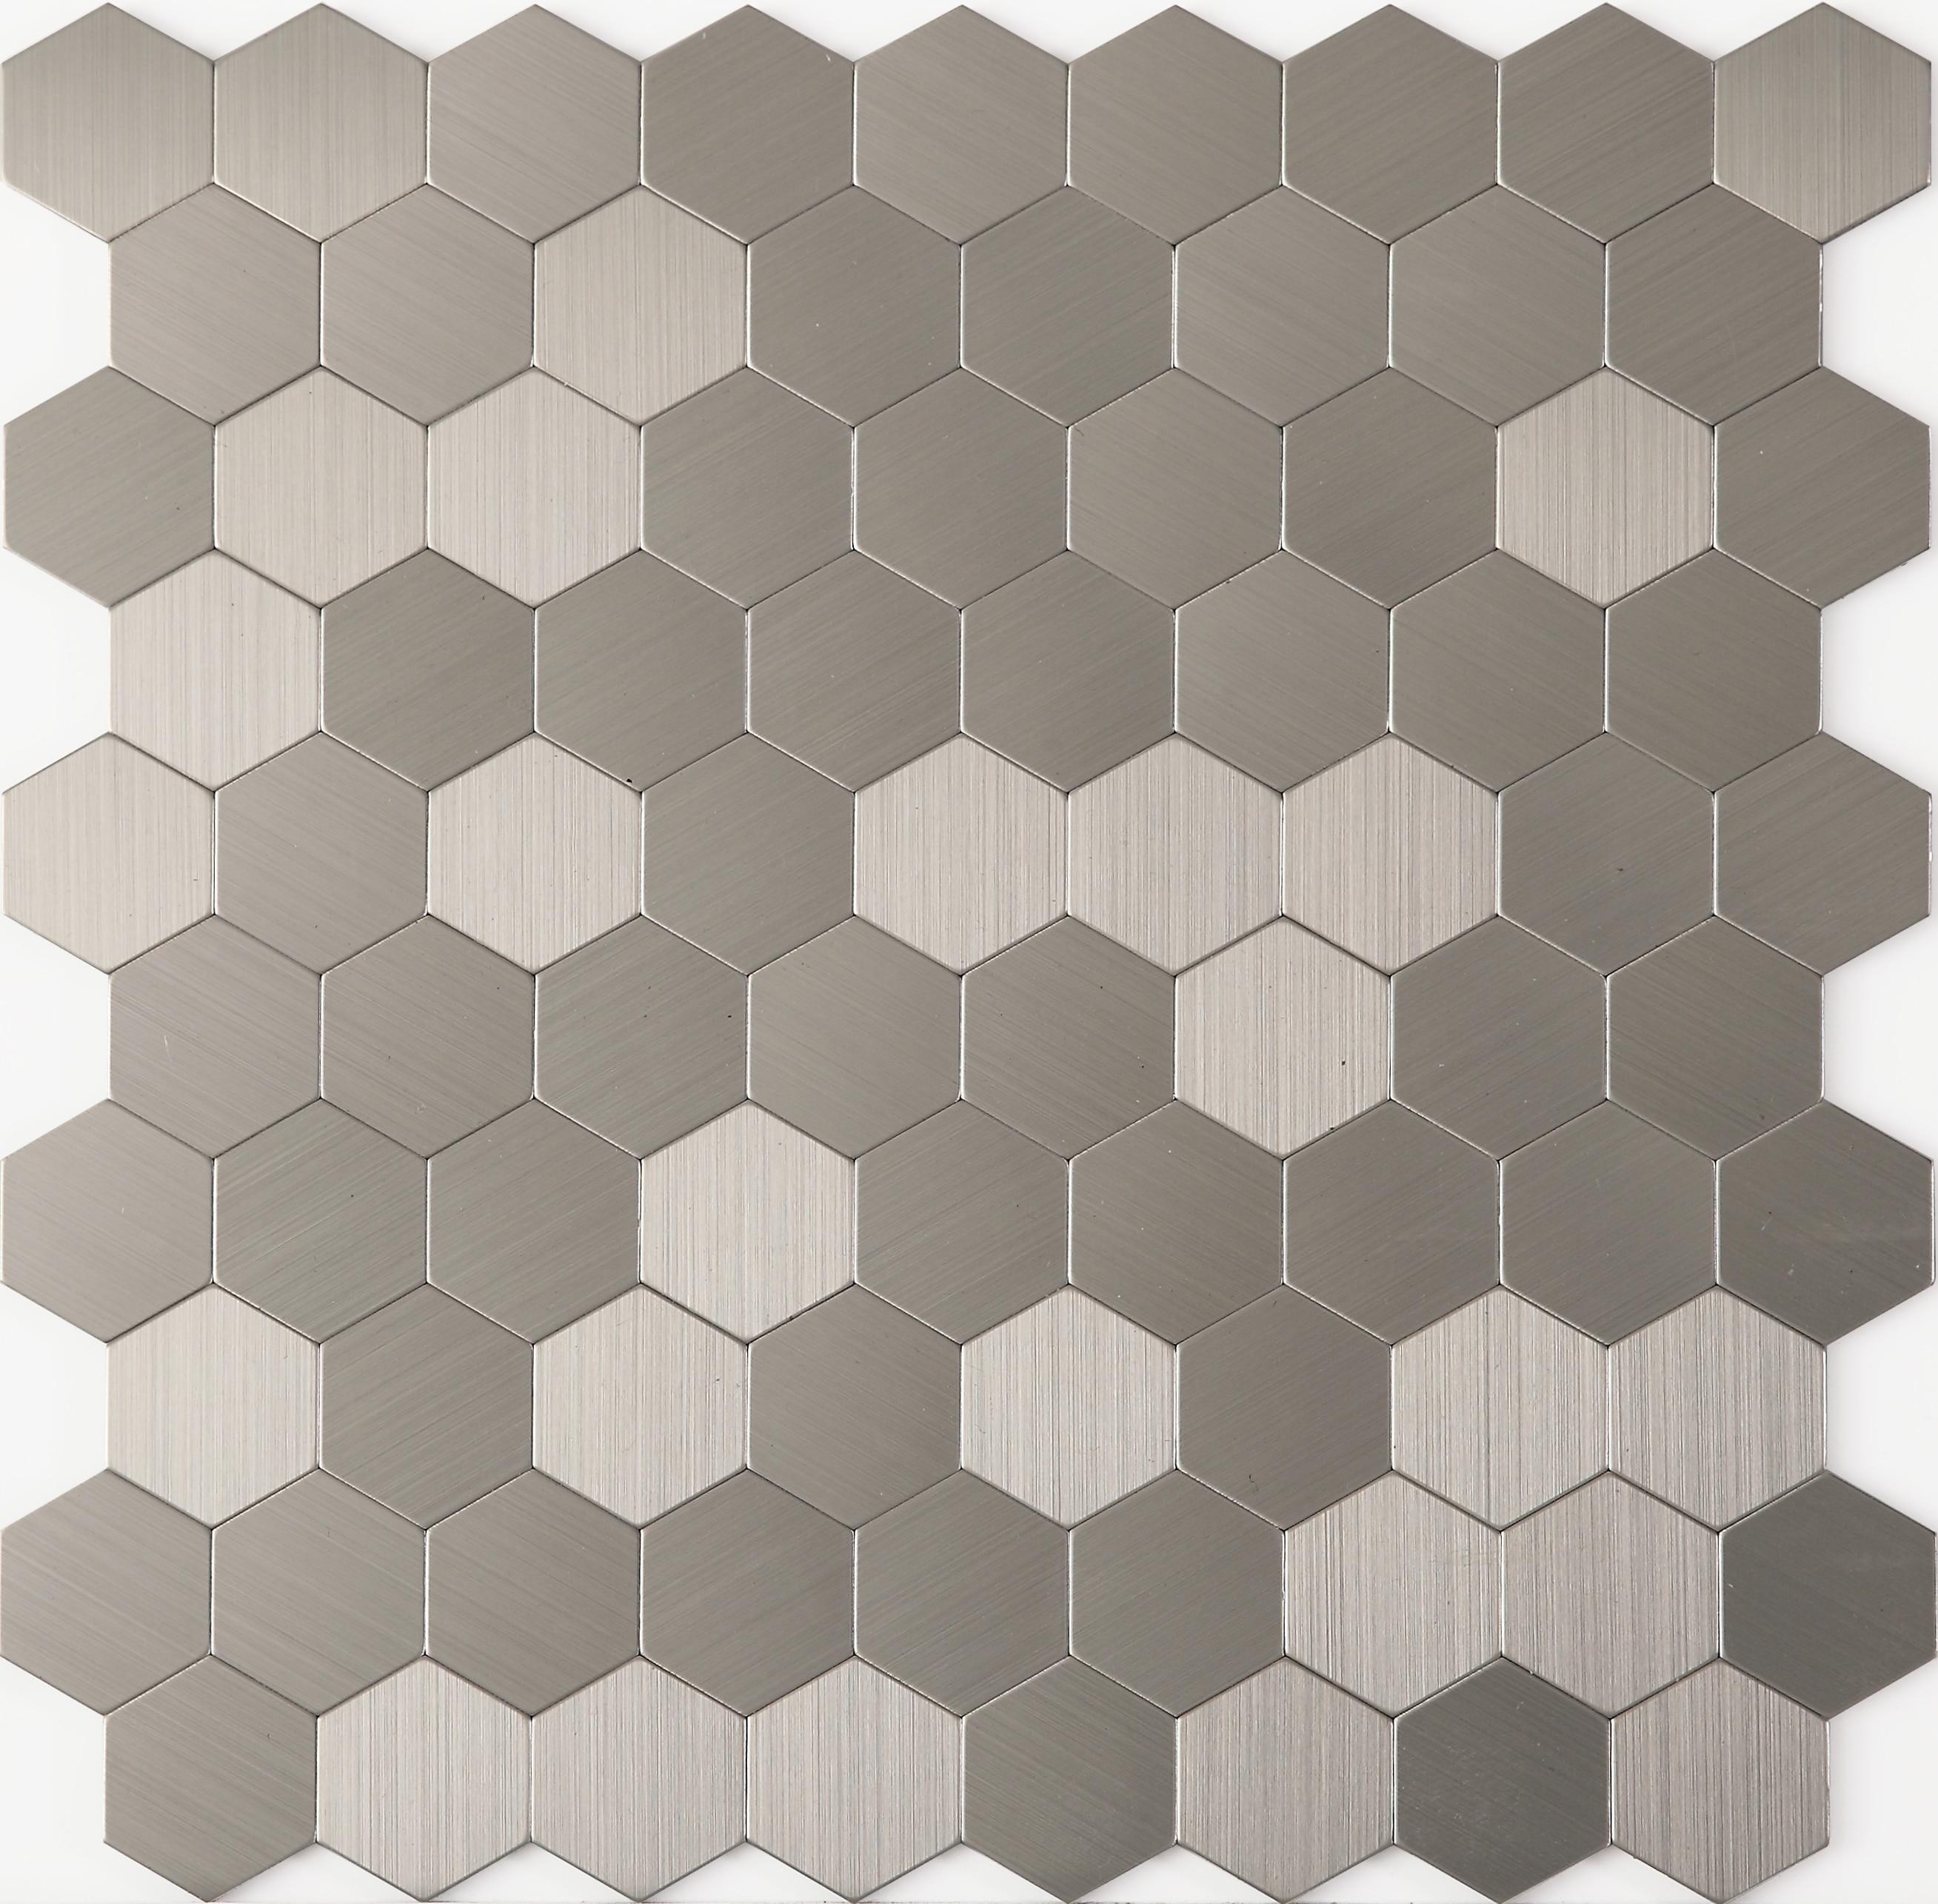 Self Adhesive Kitchen Backsplash Tiles, Hexagon Metal Mosaic Tiles, Hexagon Tiles For Wall, LSAP06